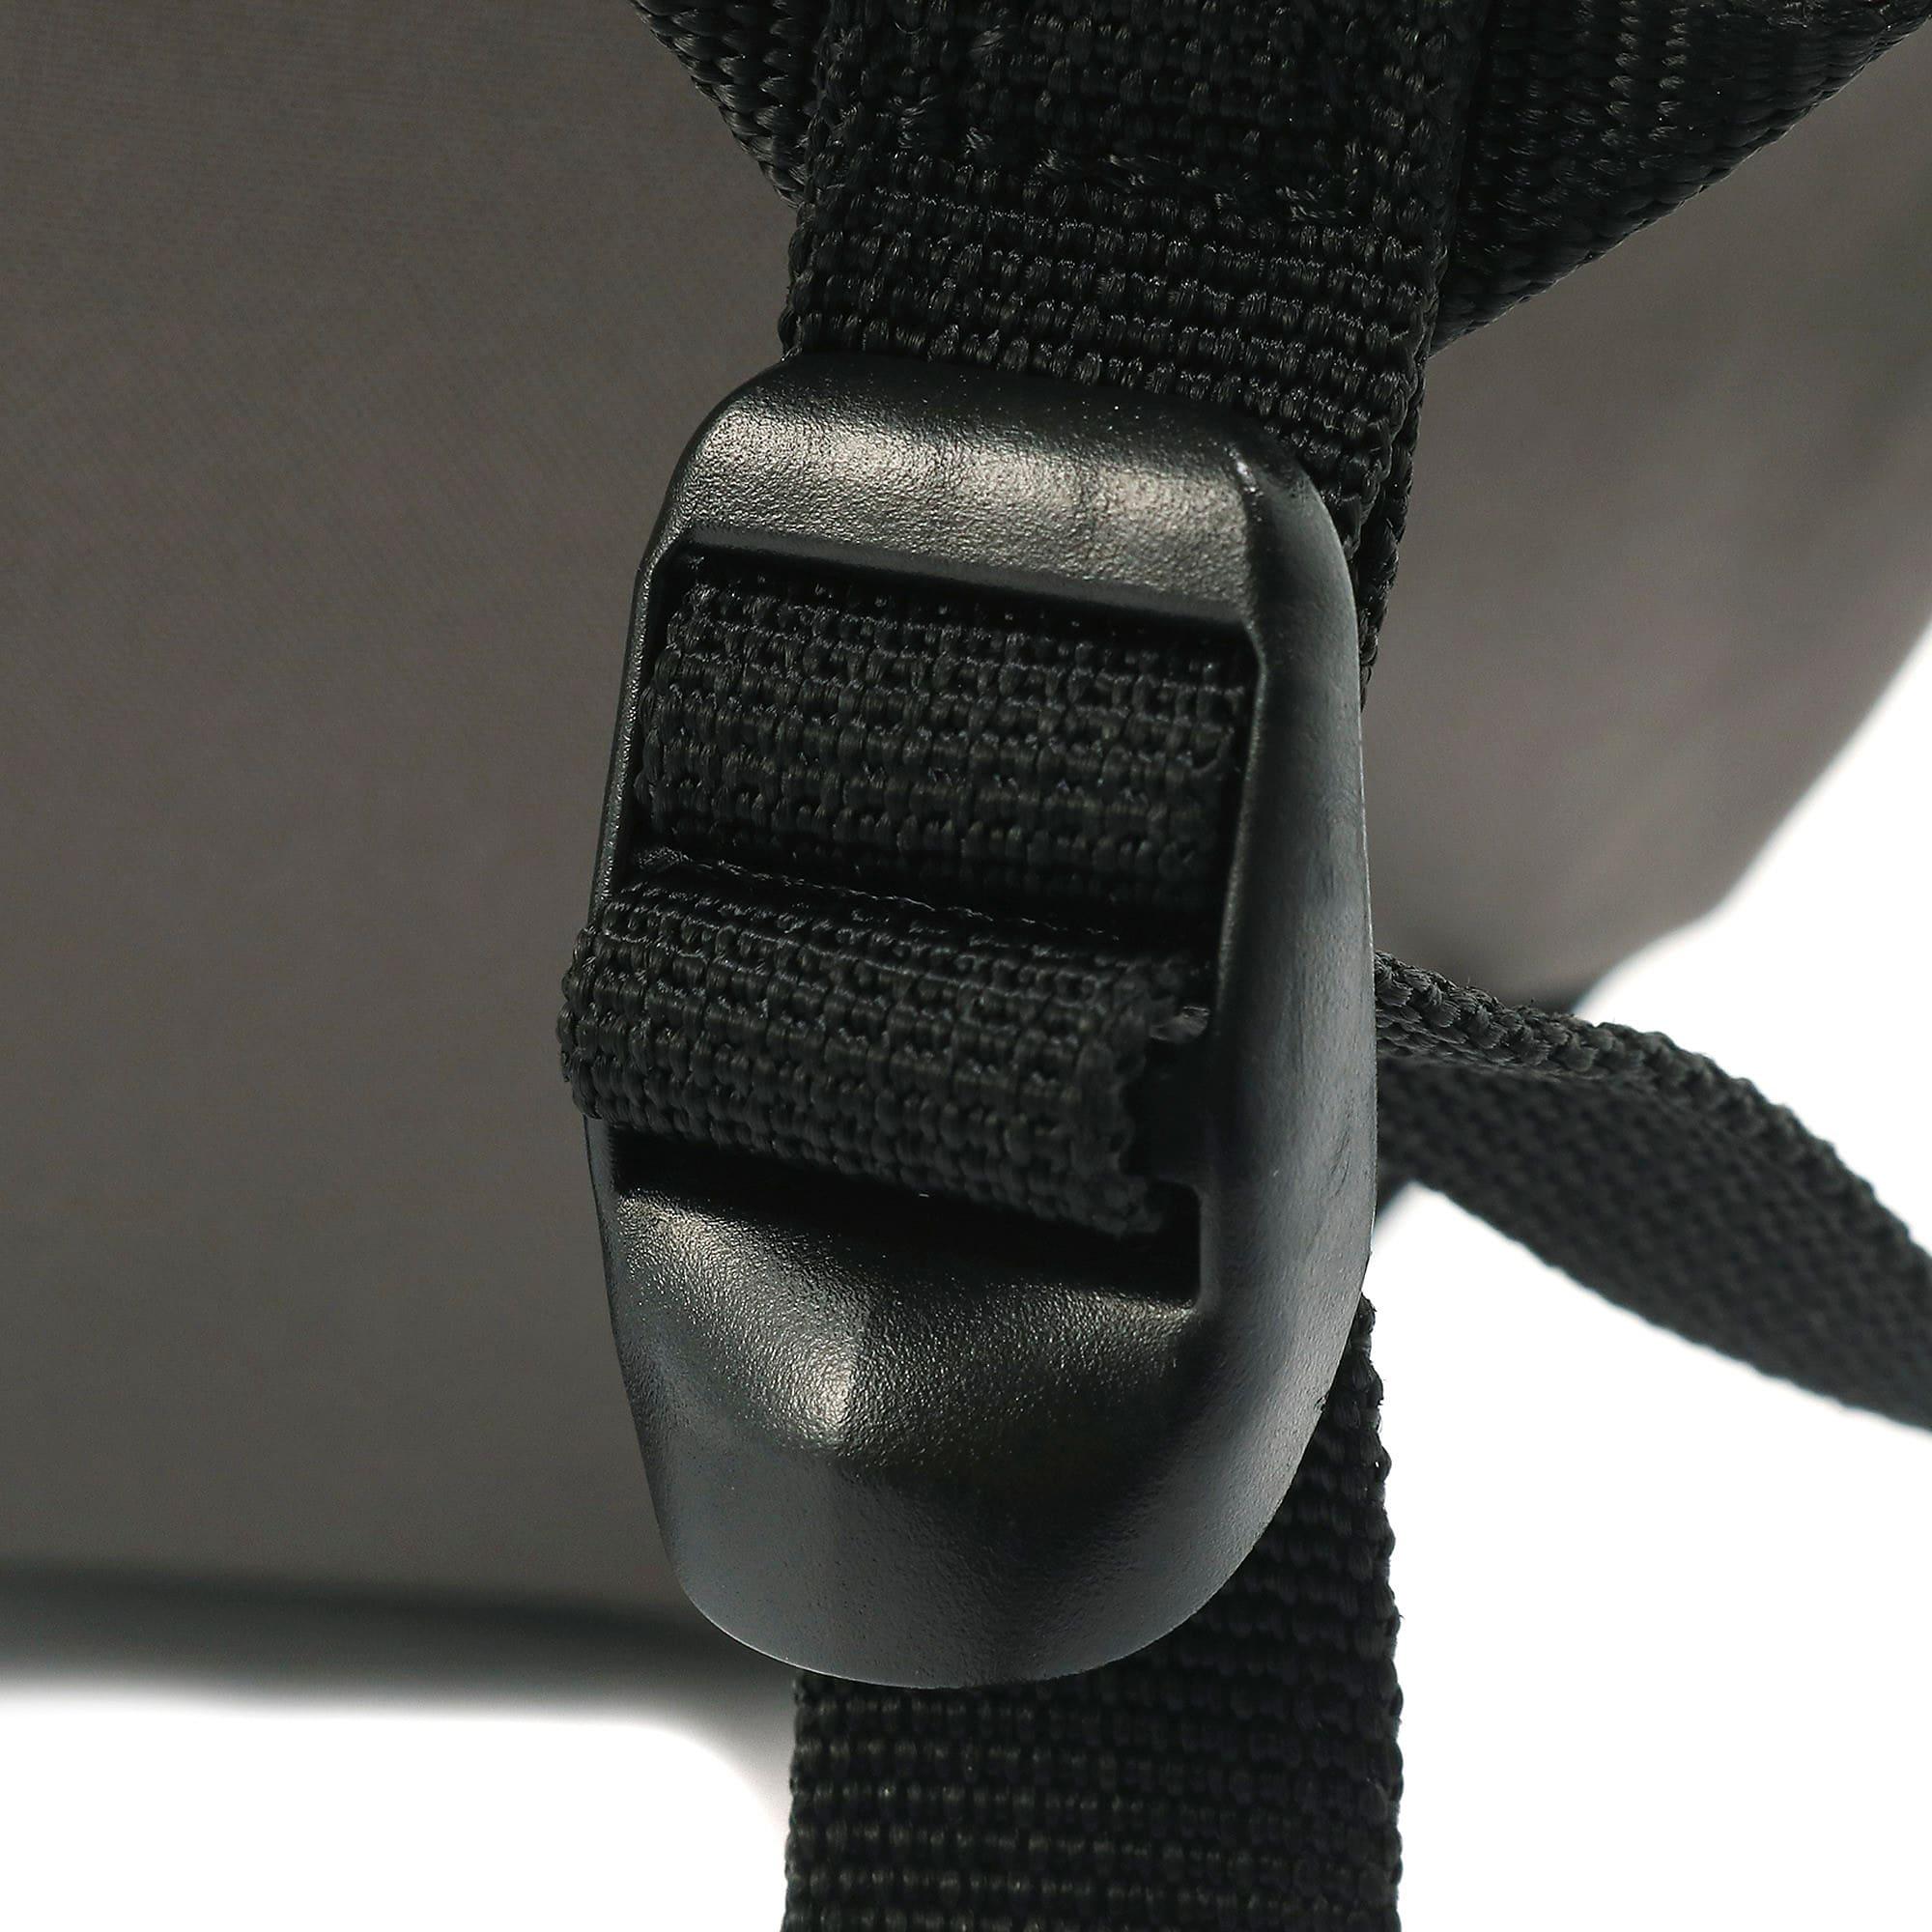 Thumbnail 9 of プーマ ソール スマートバッグ 18L, Charcoal Gray-Puma White, medium-JPN